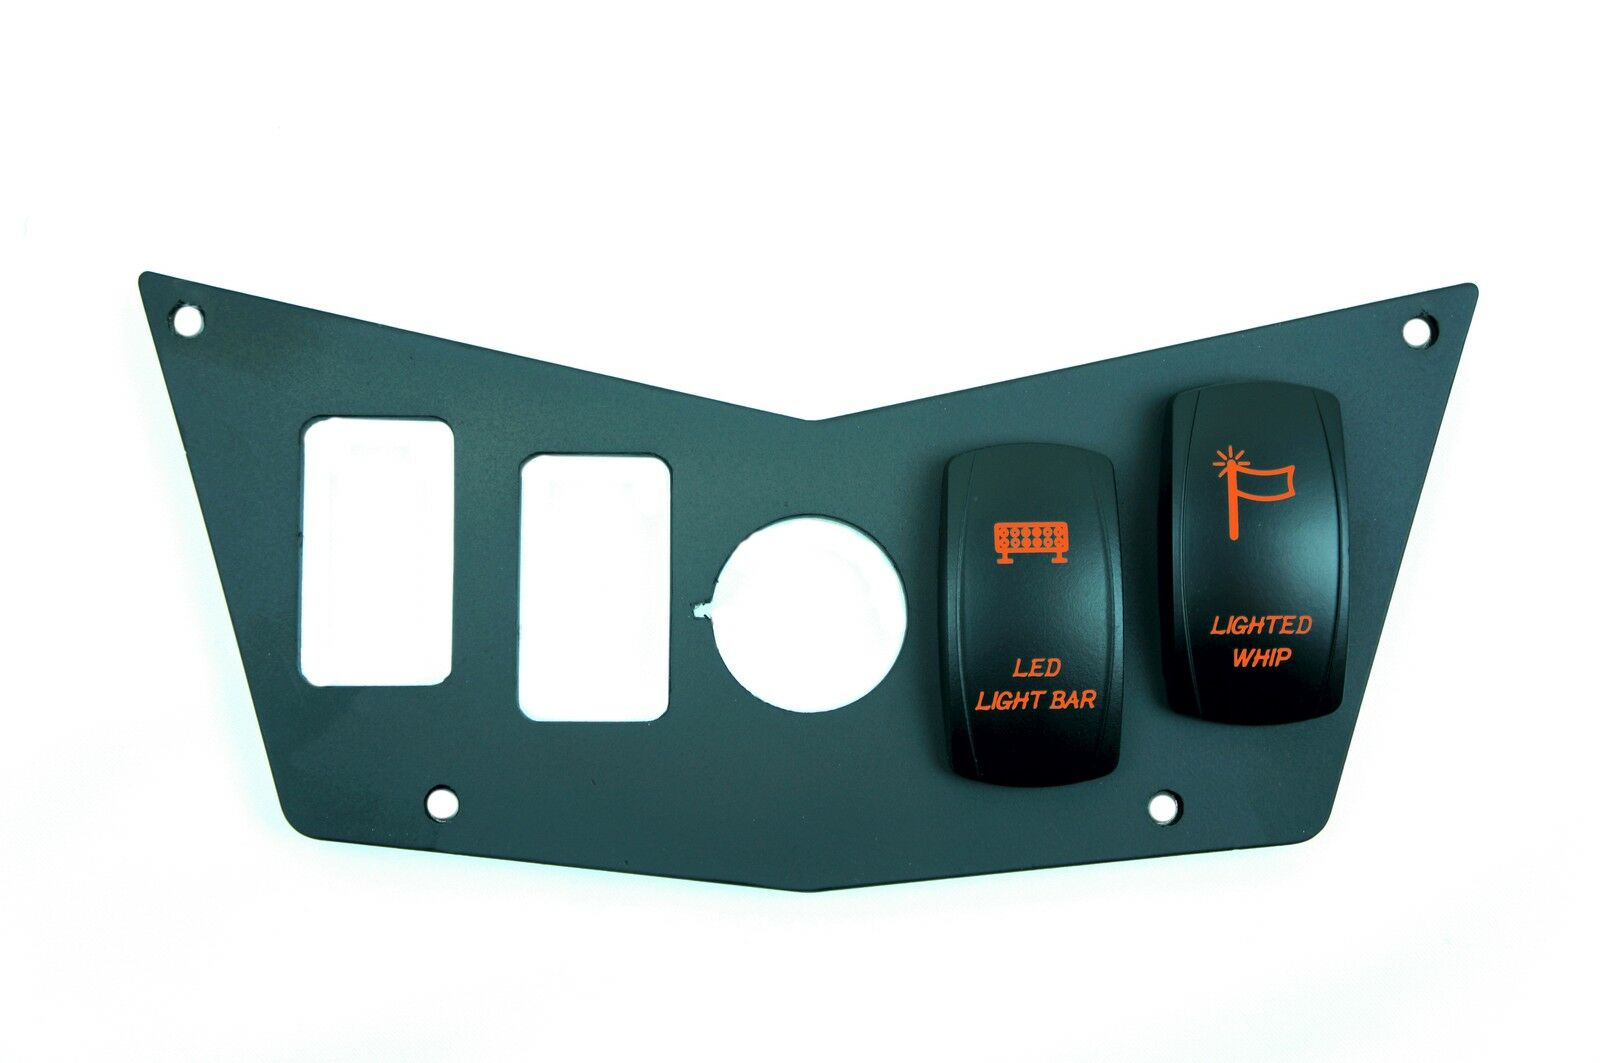 4 switch dash panel polaris rzr 570 800 900 xp 2008 2014 with 2 free switches ebay